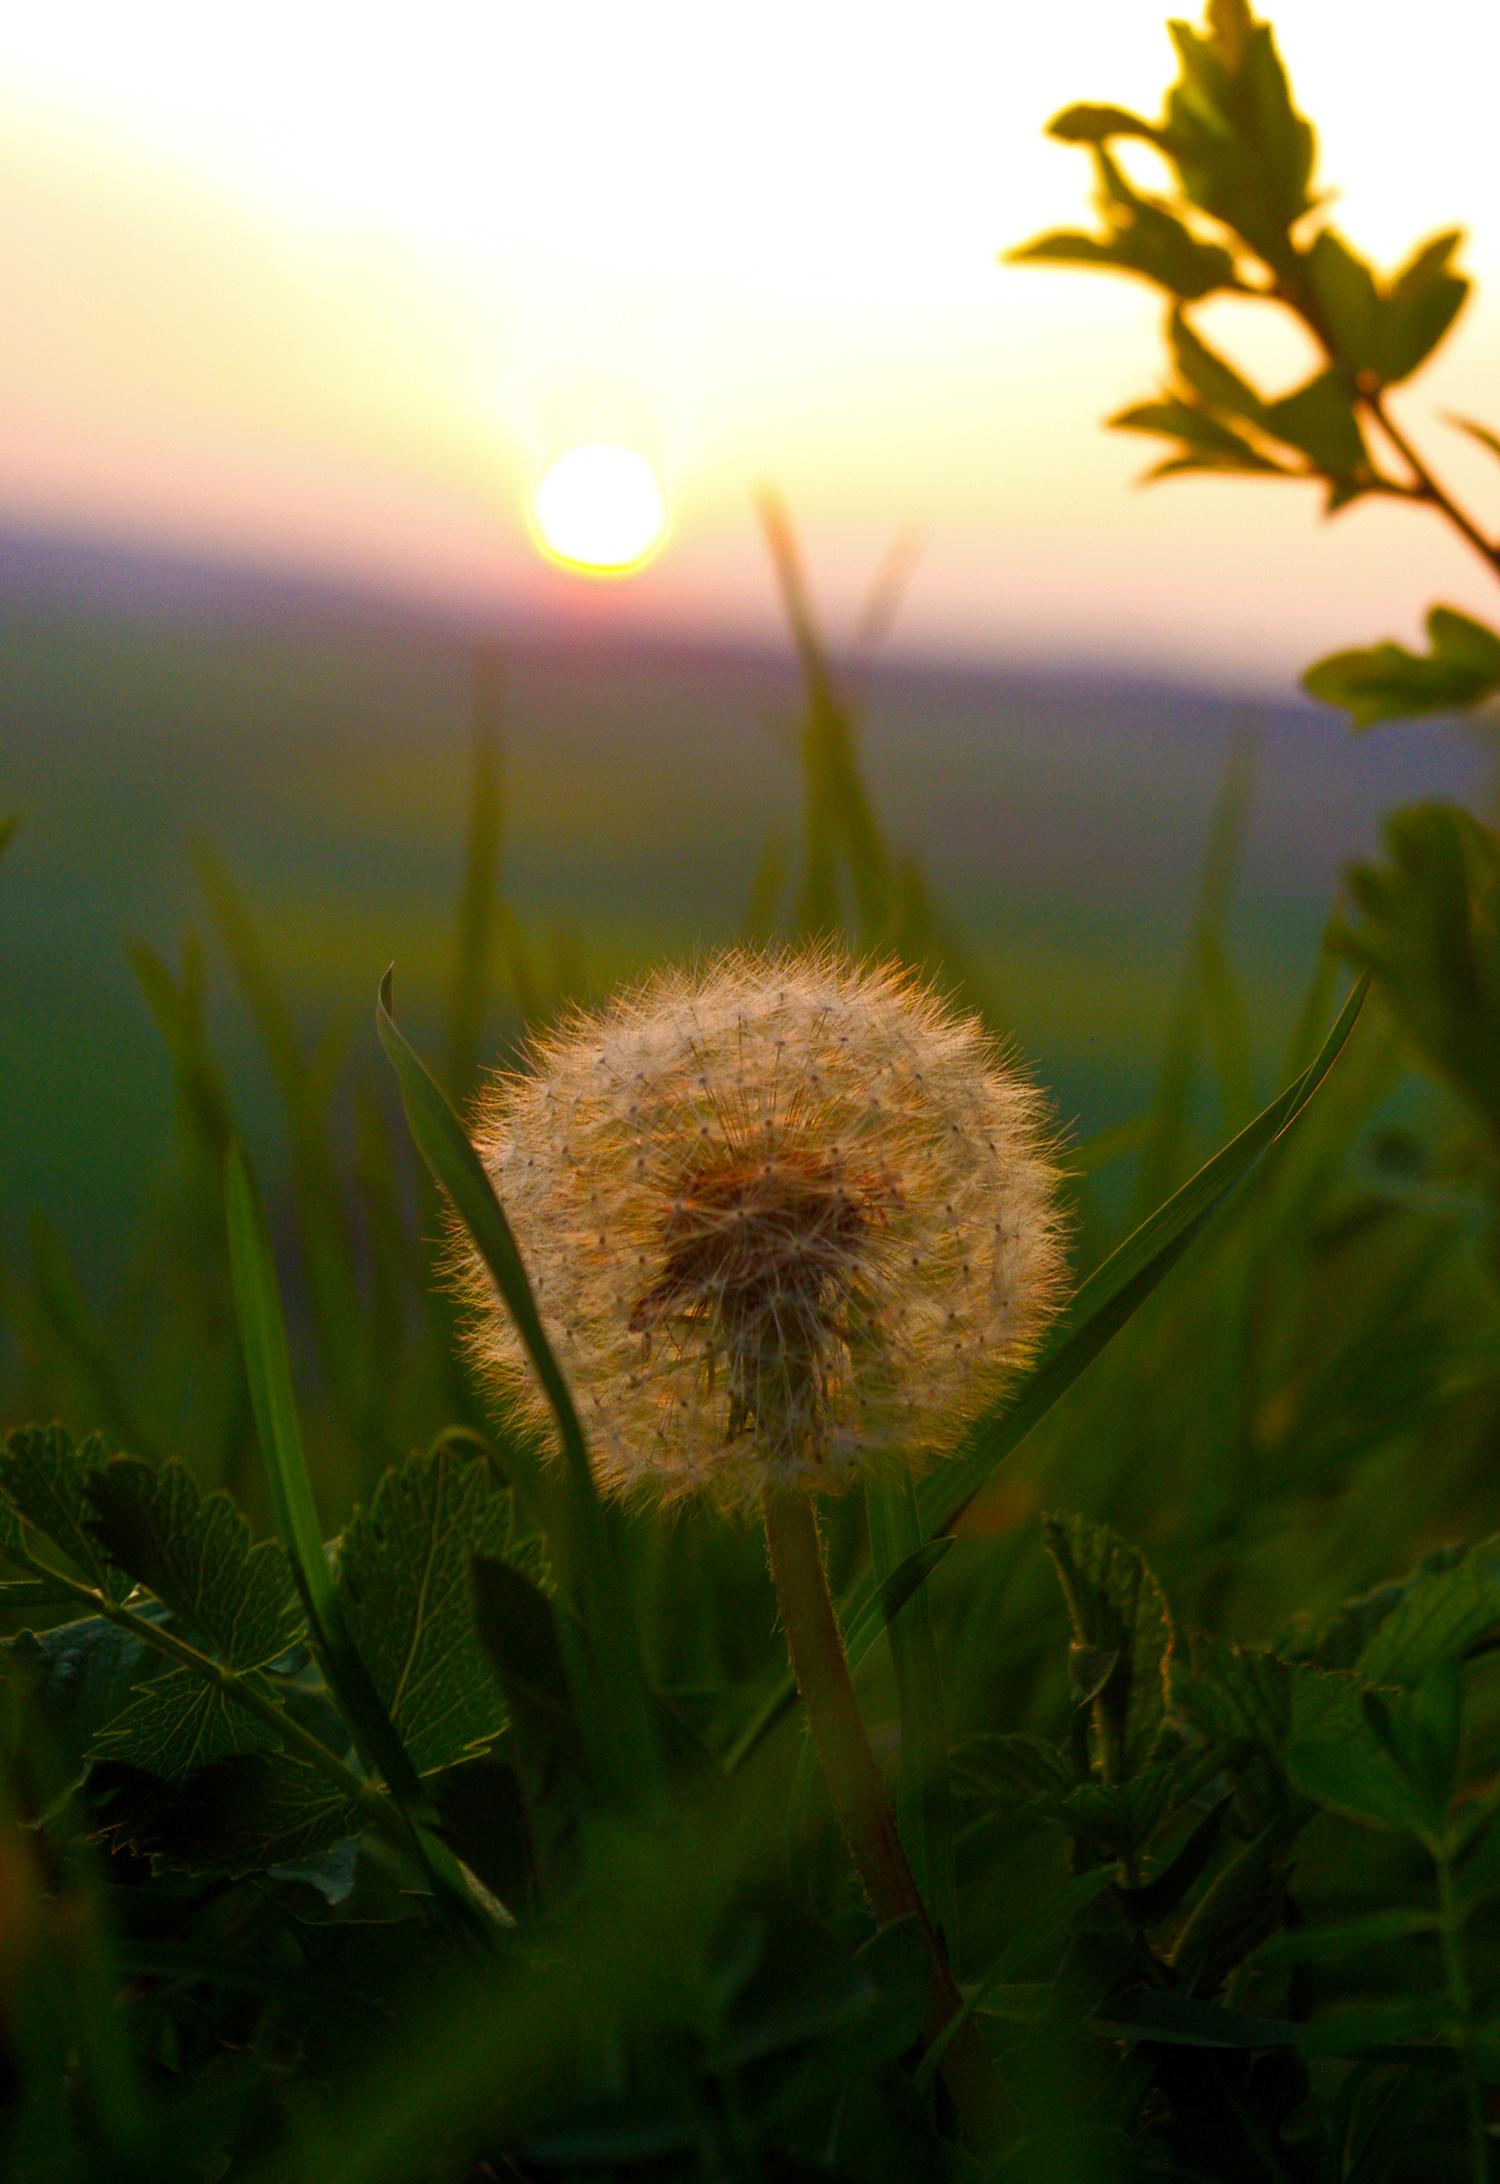 Pusteblume vor Sonnenuntergang